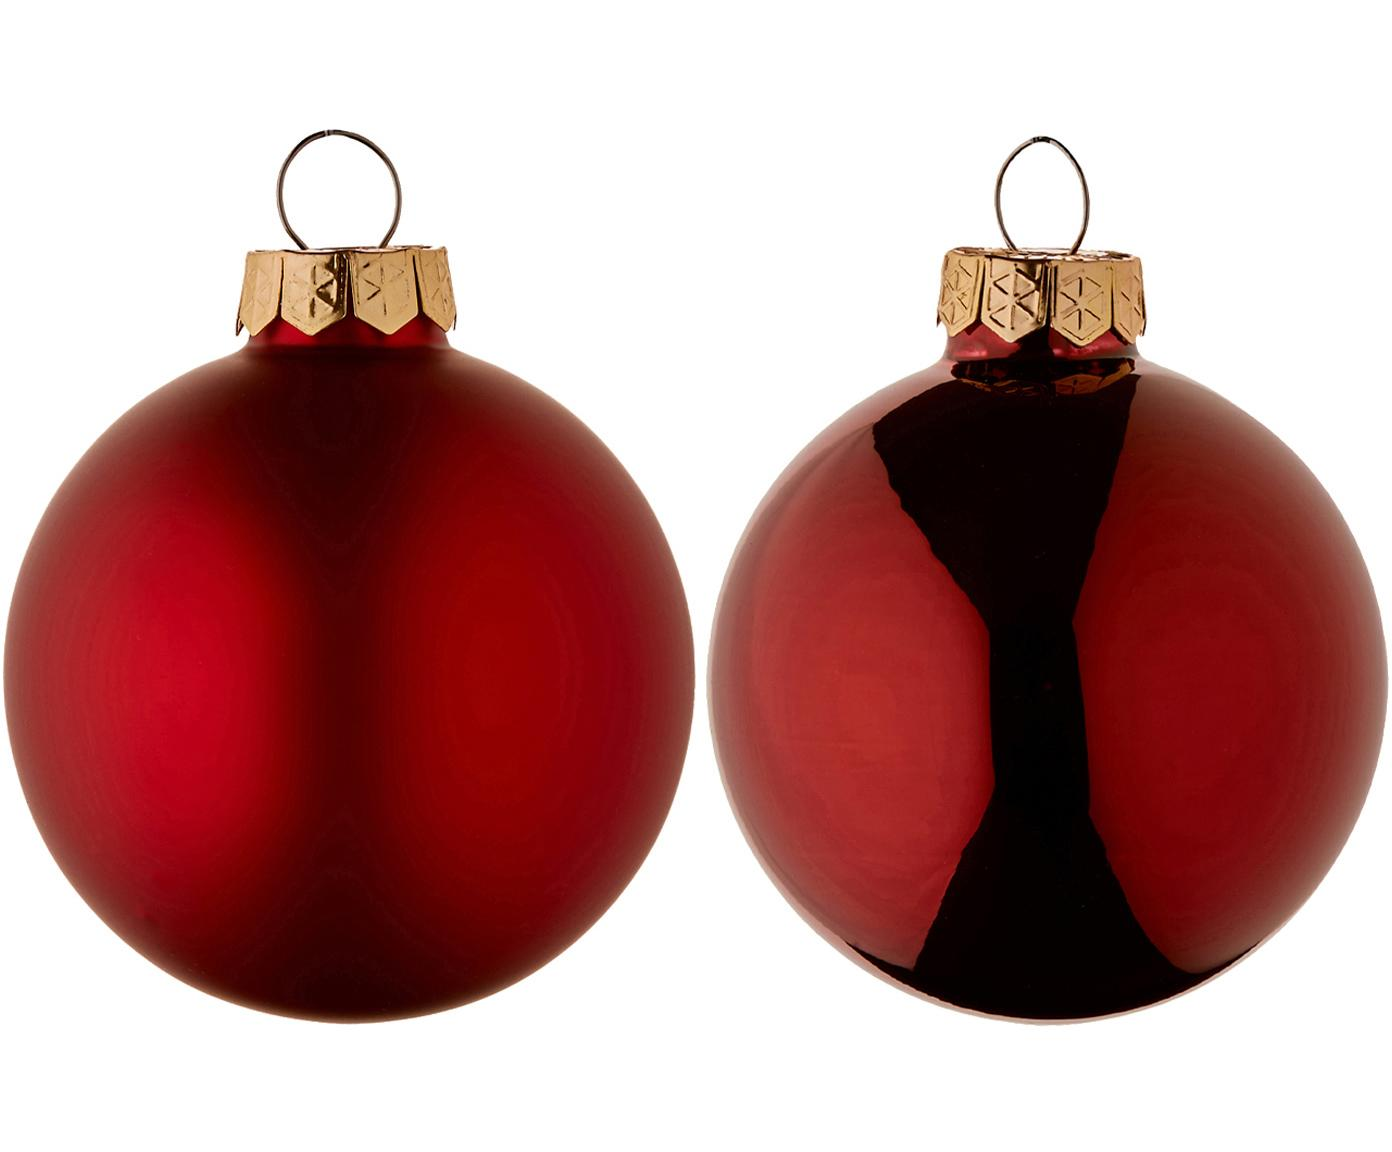 Weihnachtskugel-Set EvergreenØ6cm, 10-tlg., Rot, Ø 6 cm